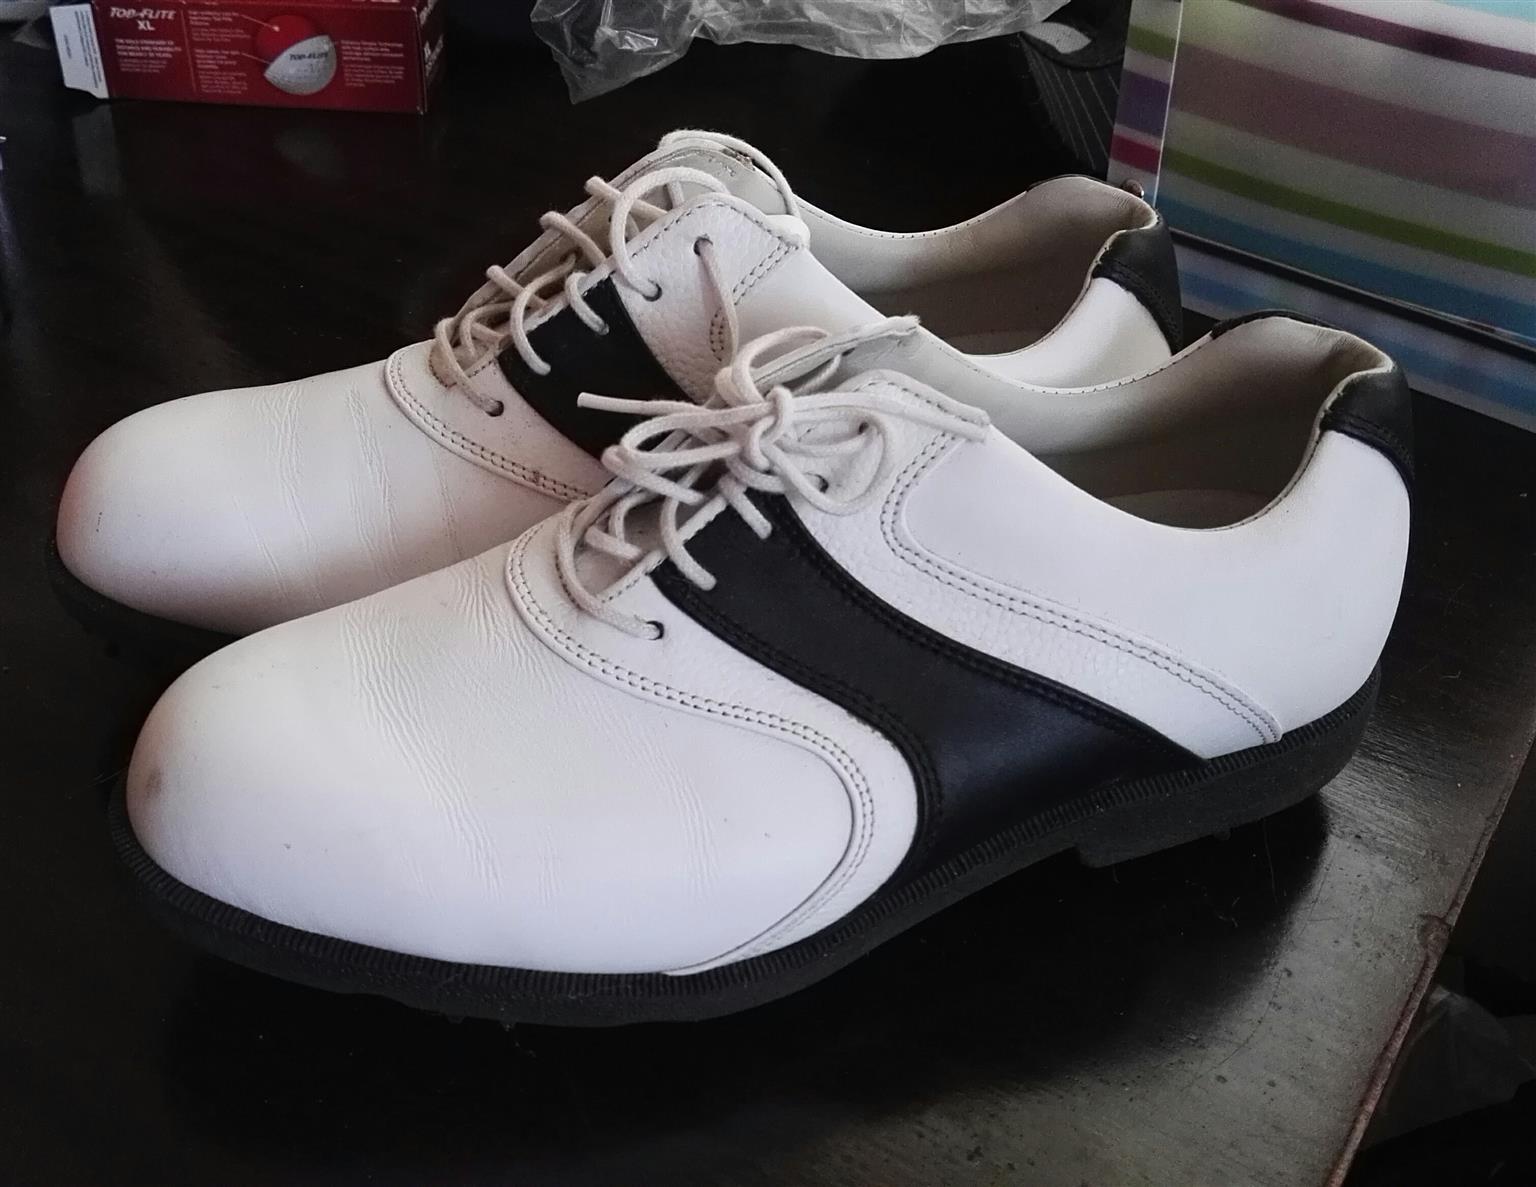 Foot joy ladies golf shoes